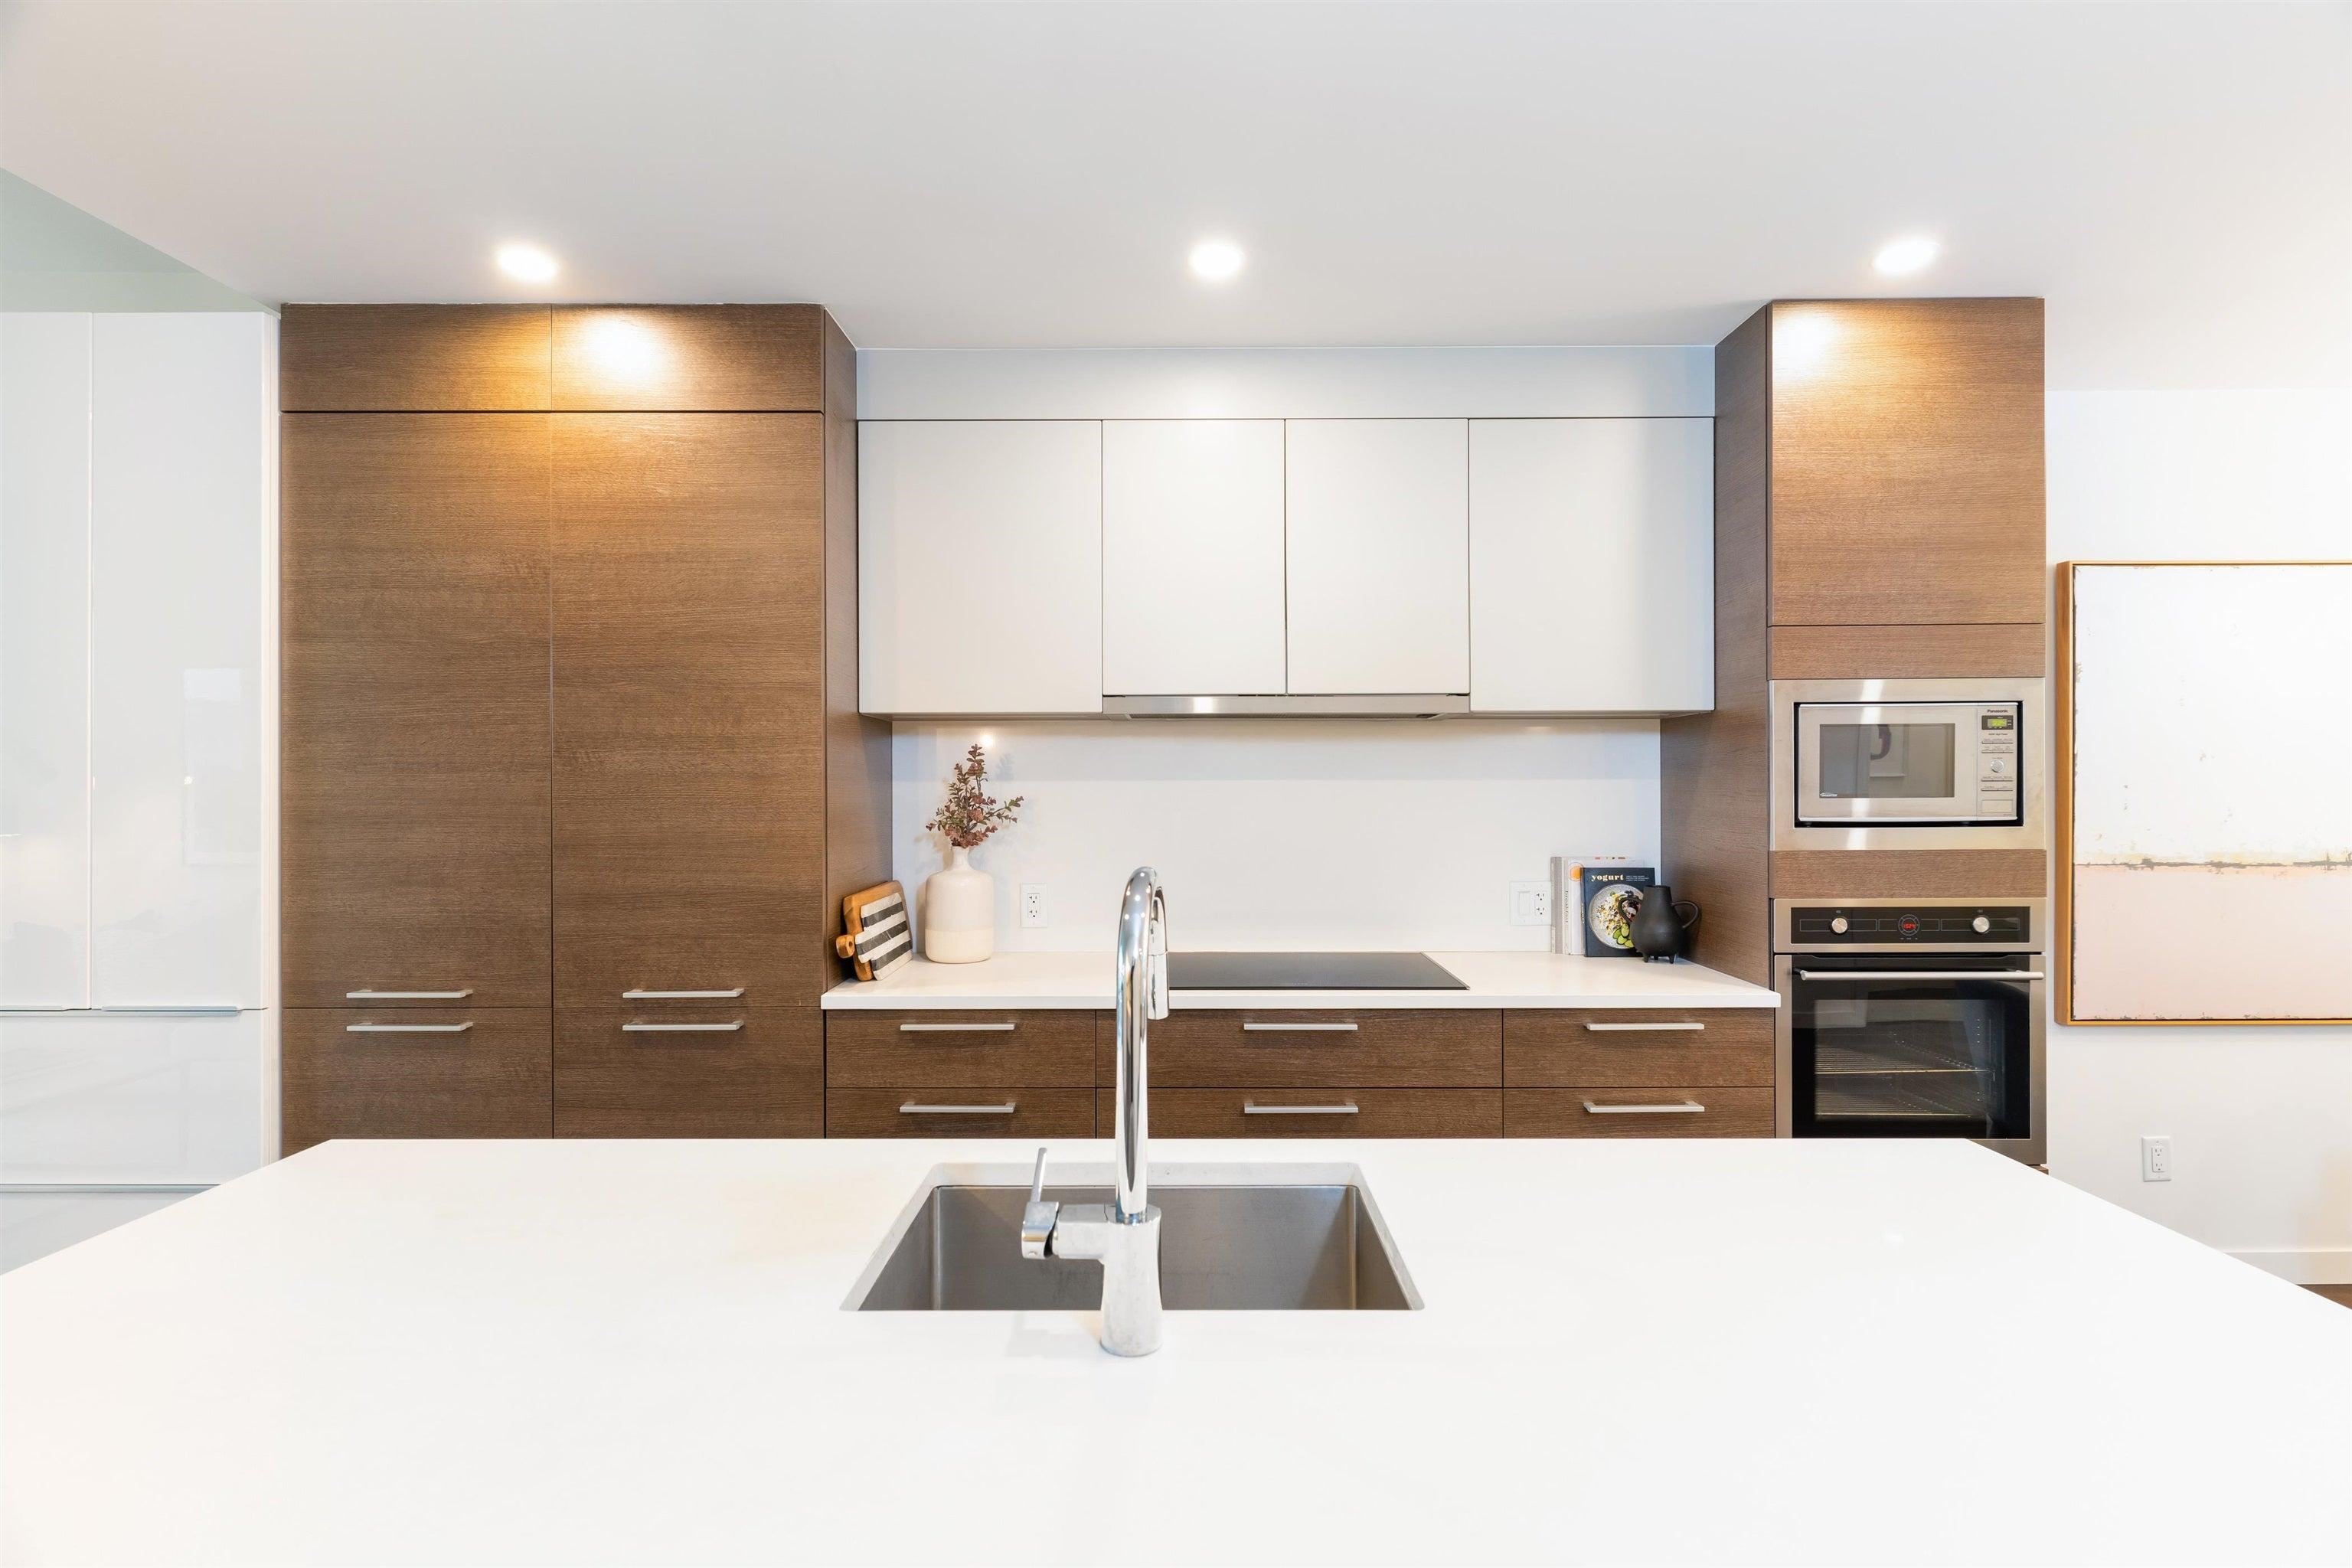 523 2508 WATSON STREET - Mount Pleasant VE Townhouse for sale, 3 Bedrooms (R2625701) - #8